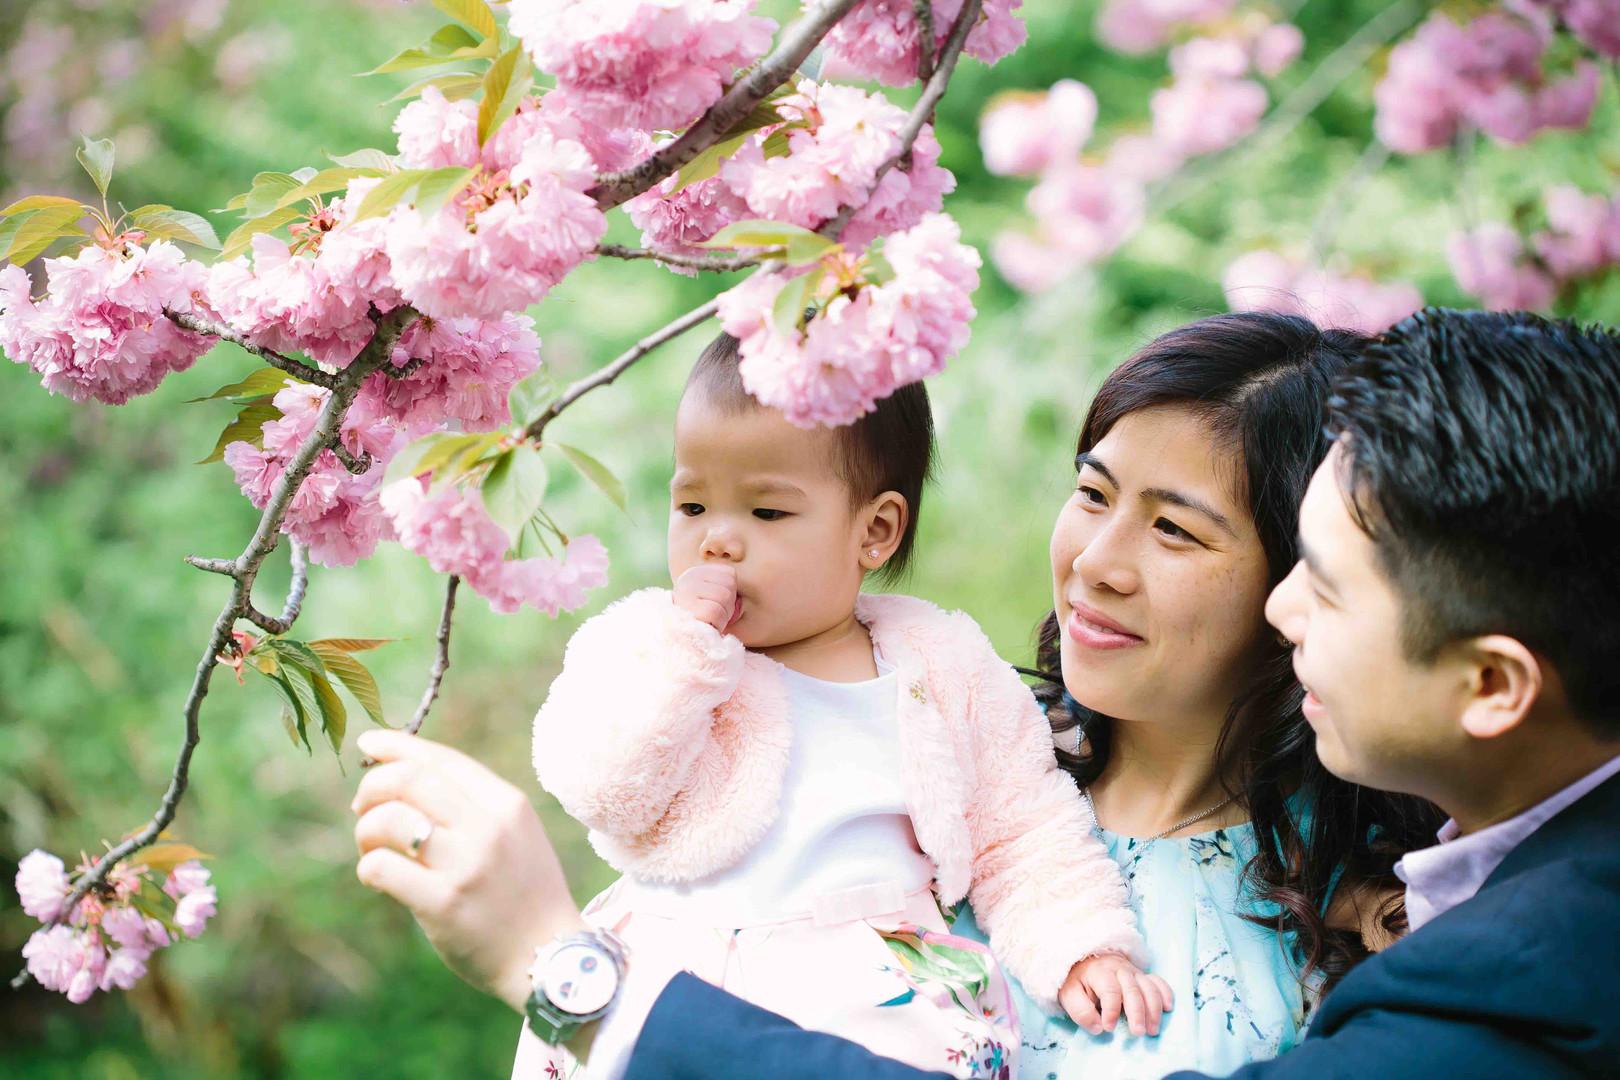 2019-goon-web-res-spring-cherry-blossom-